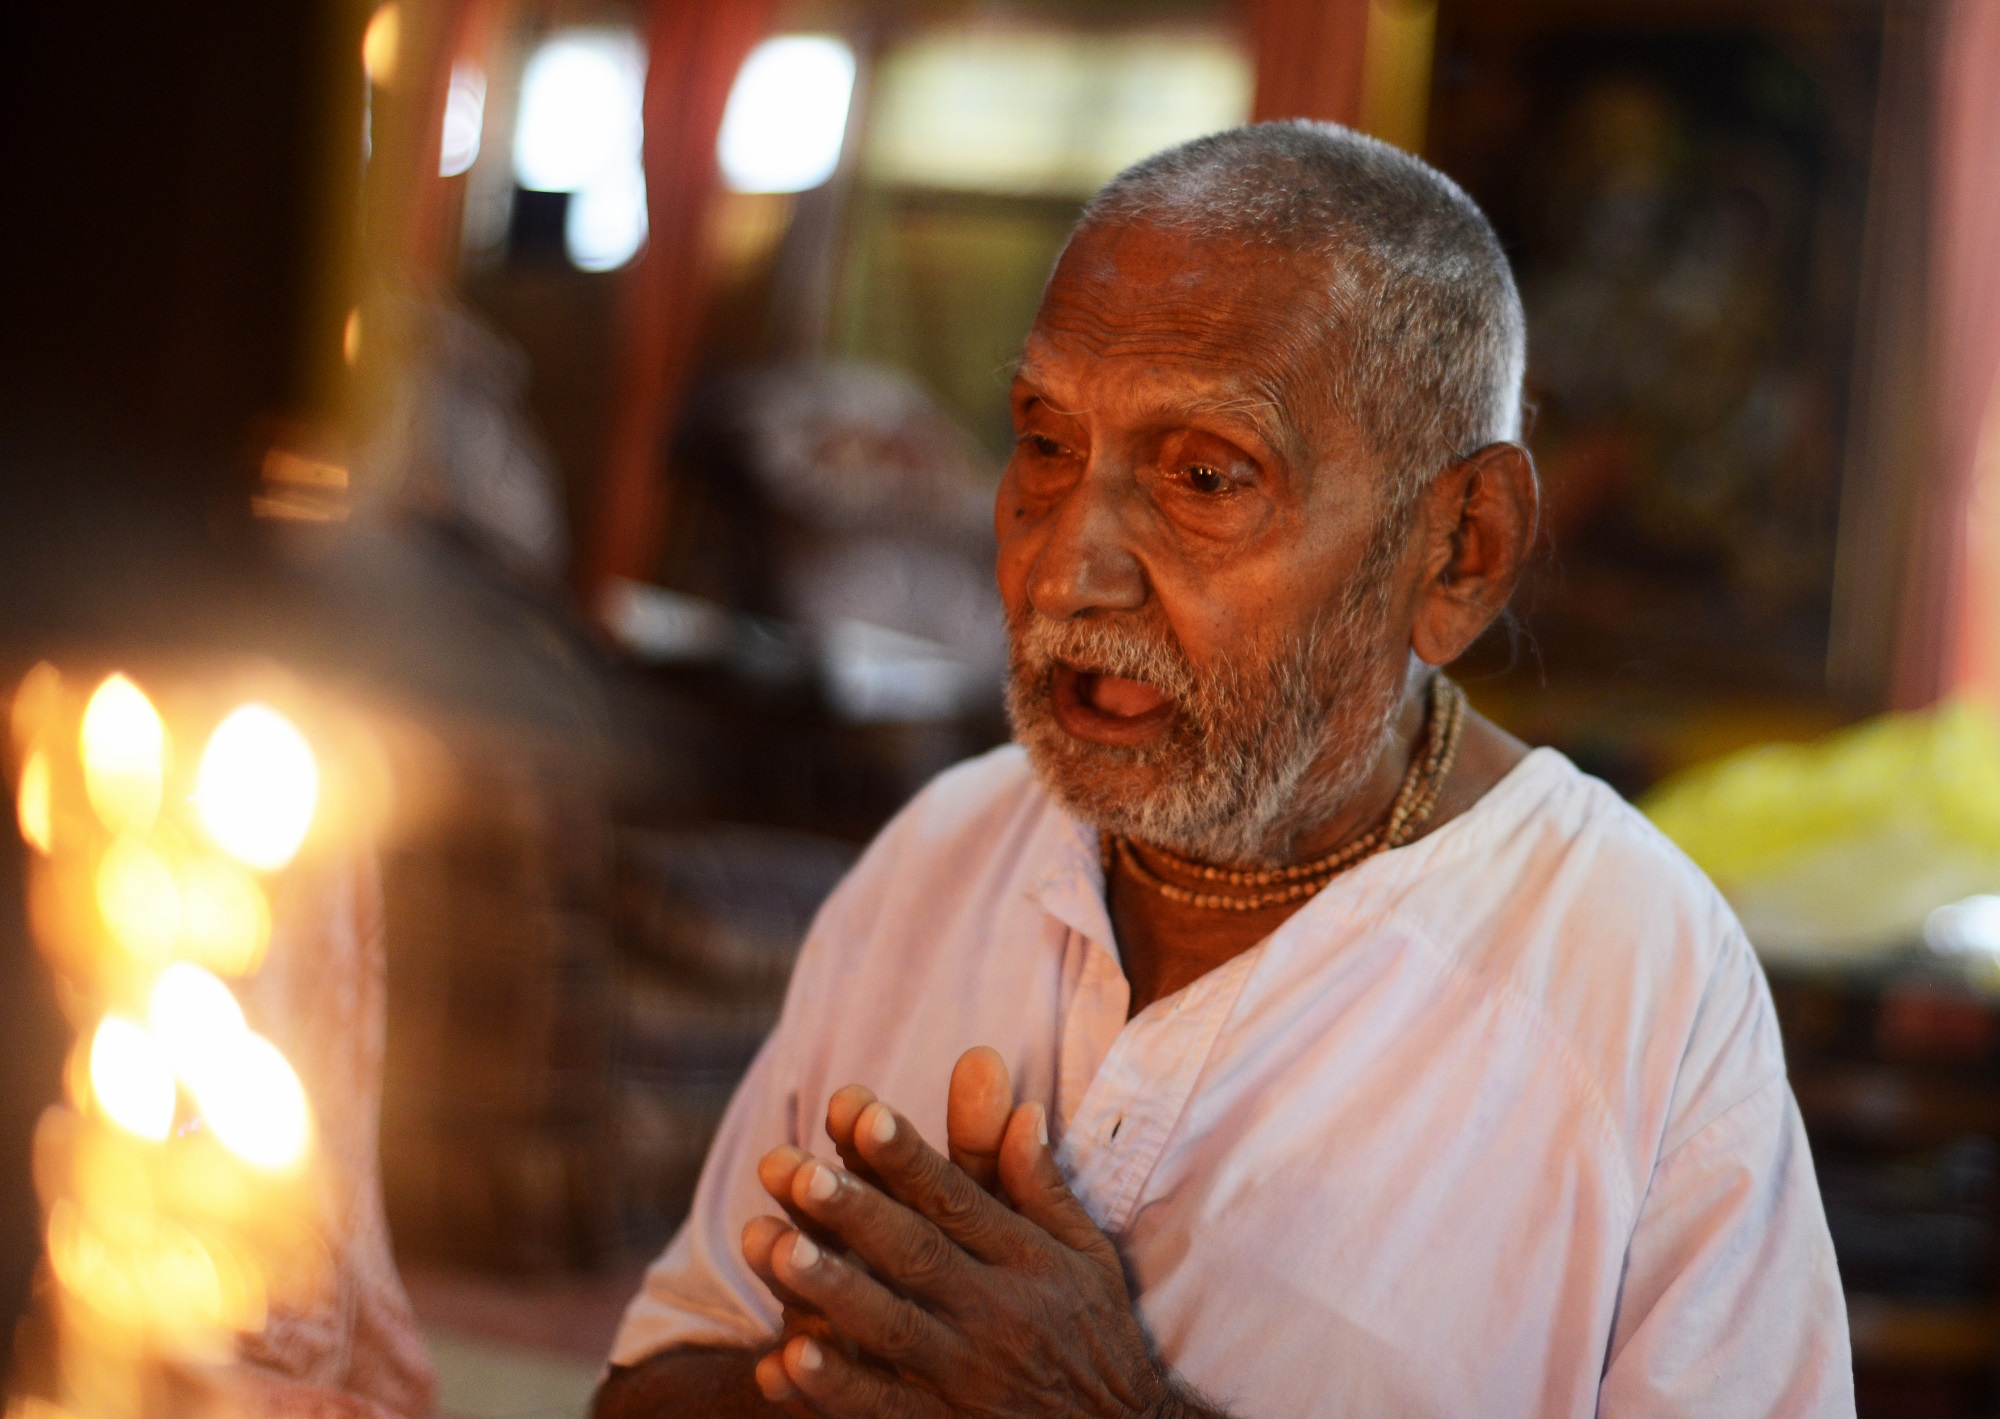 INDIA-LIFESTYLE-OLDEST-MAN